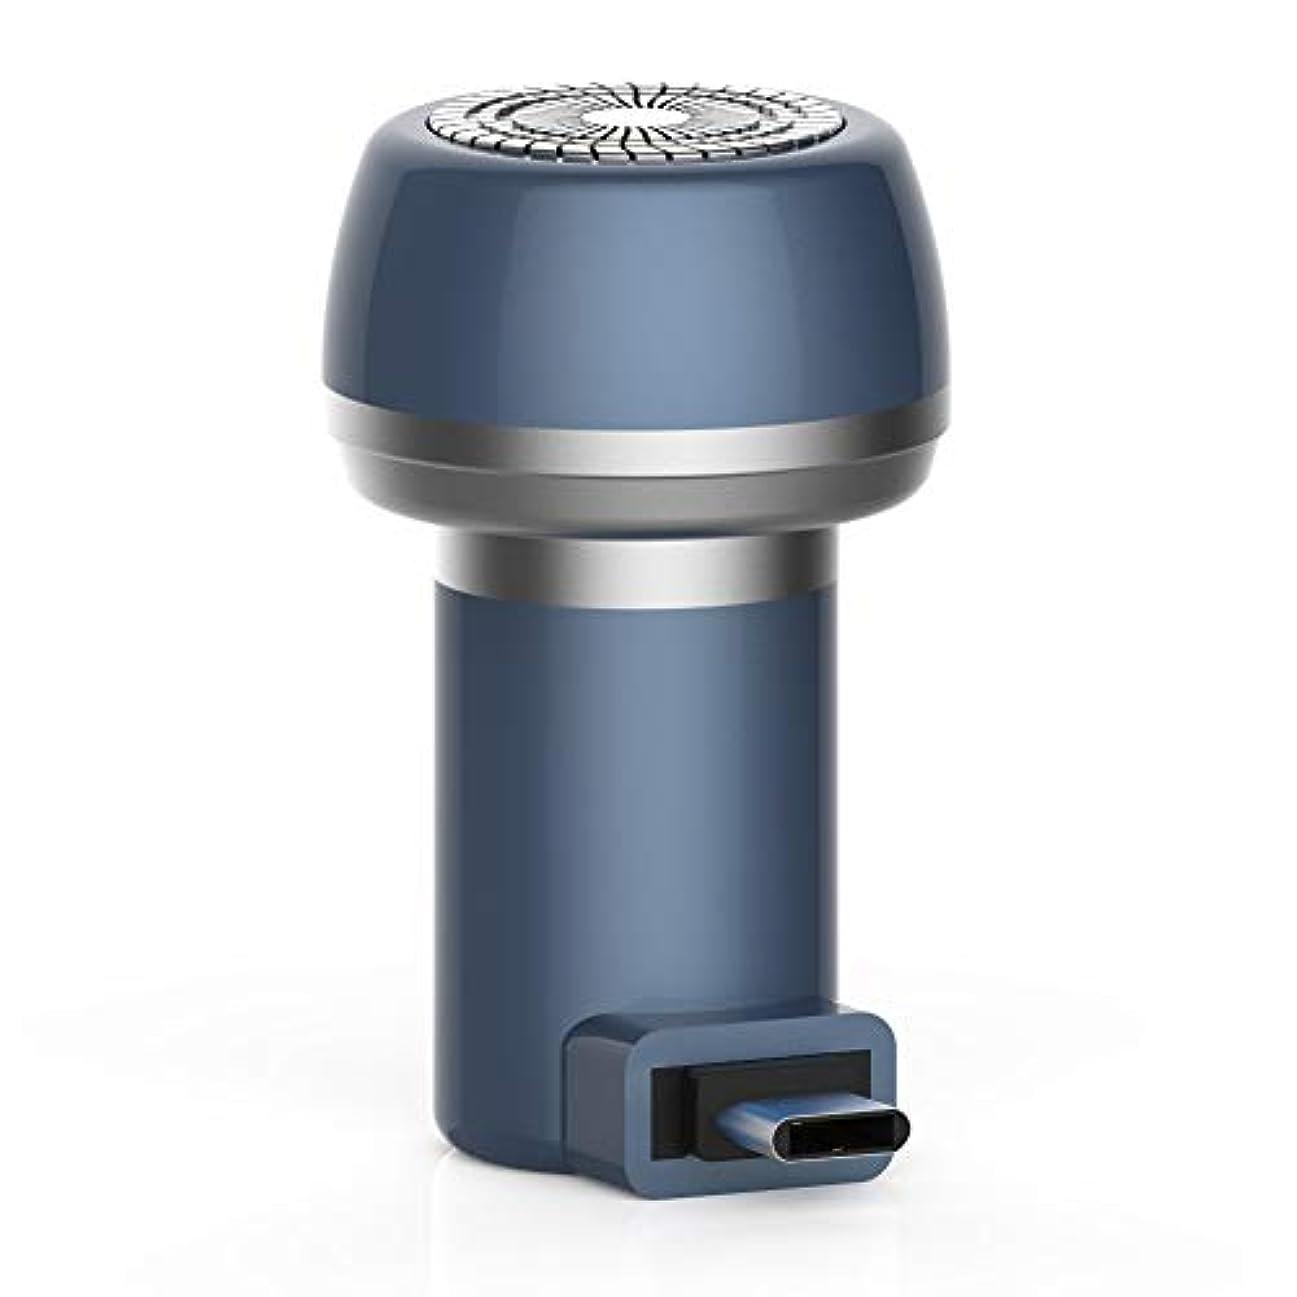 Tenflyer 2 1磁気電気シェーバーミニポータブルType-C USB防水剃刀